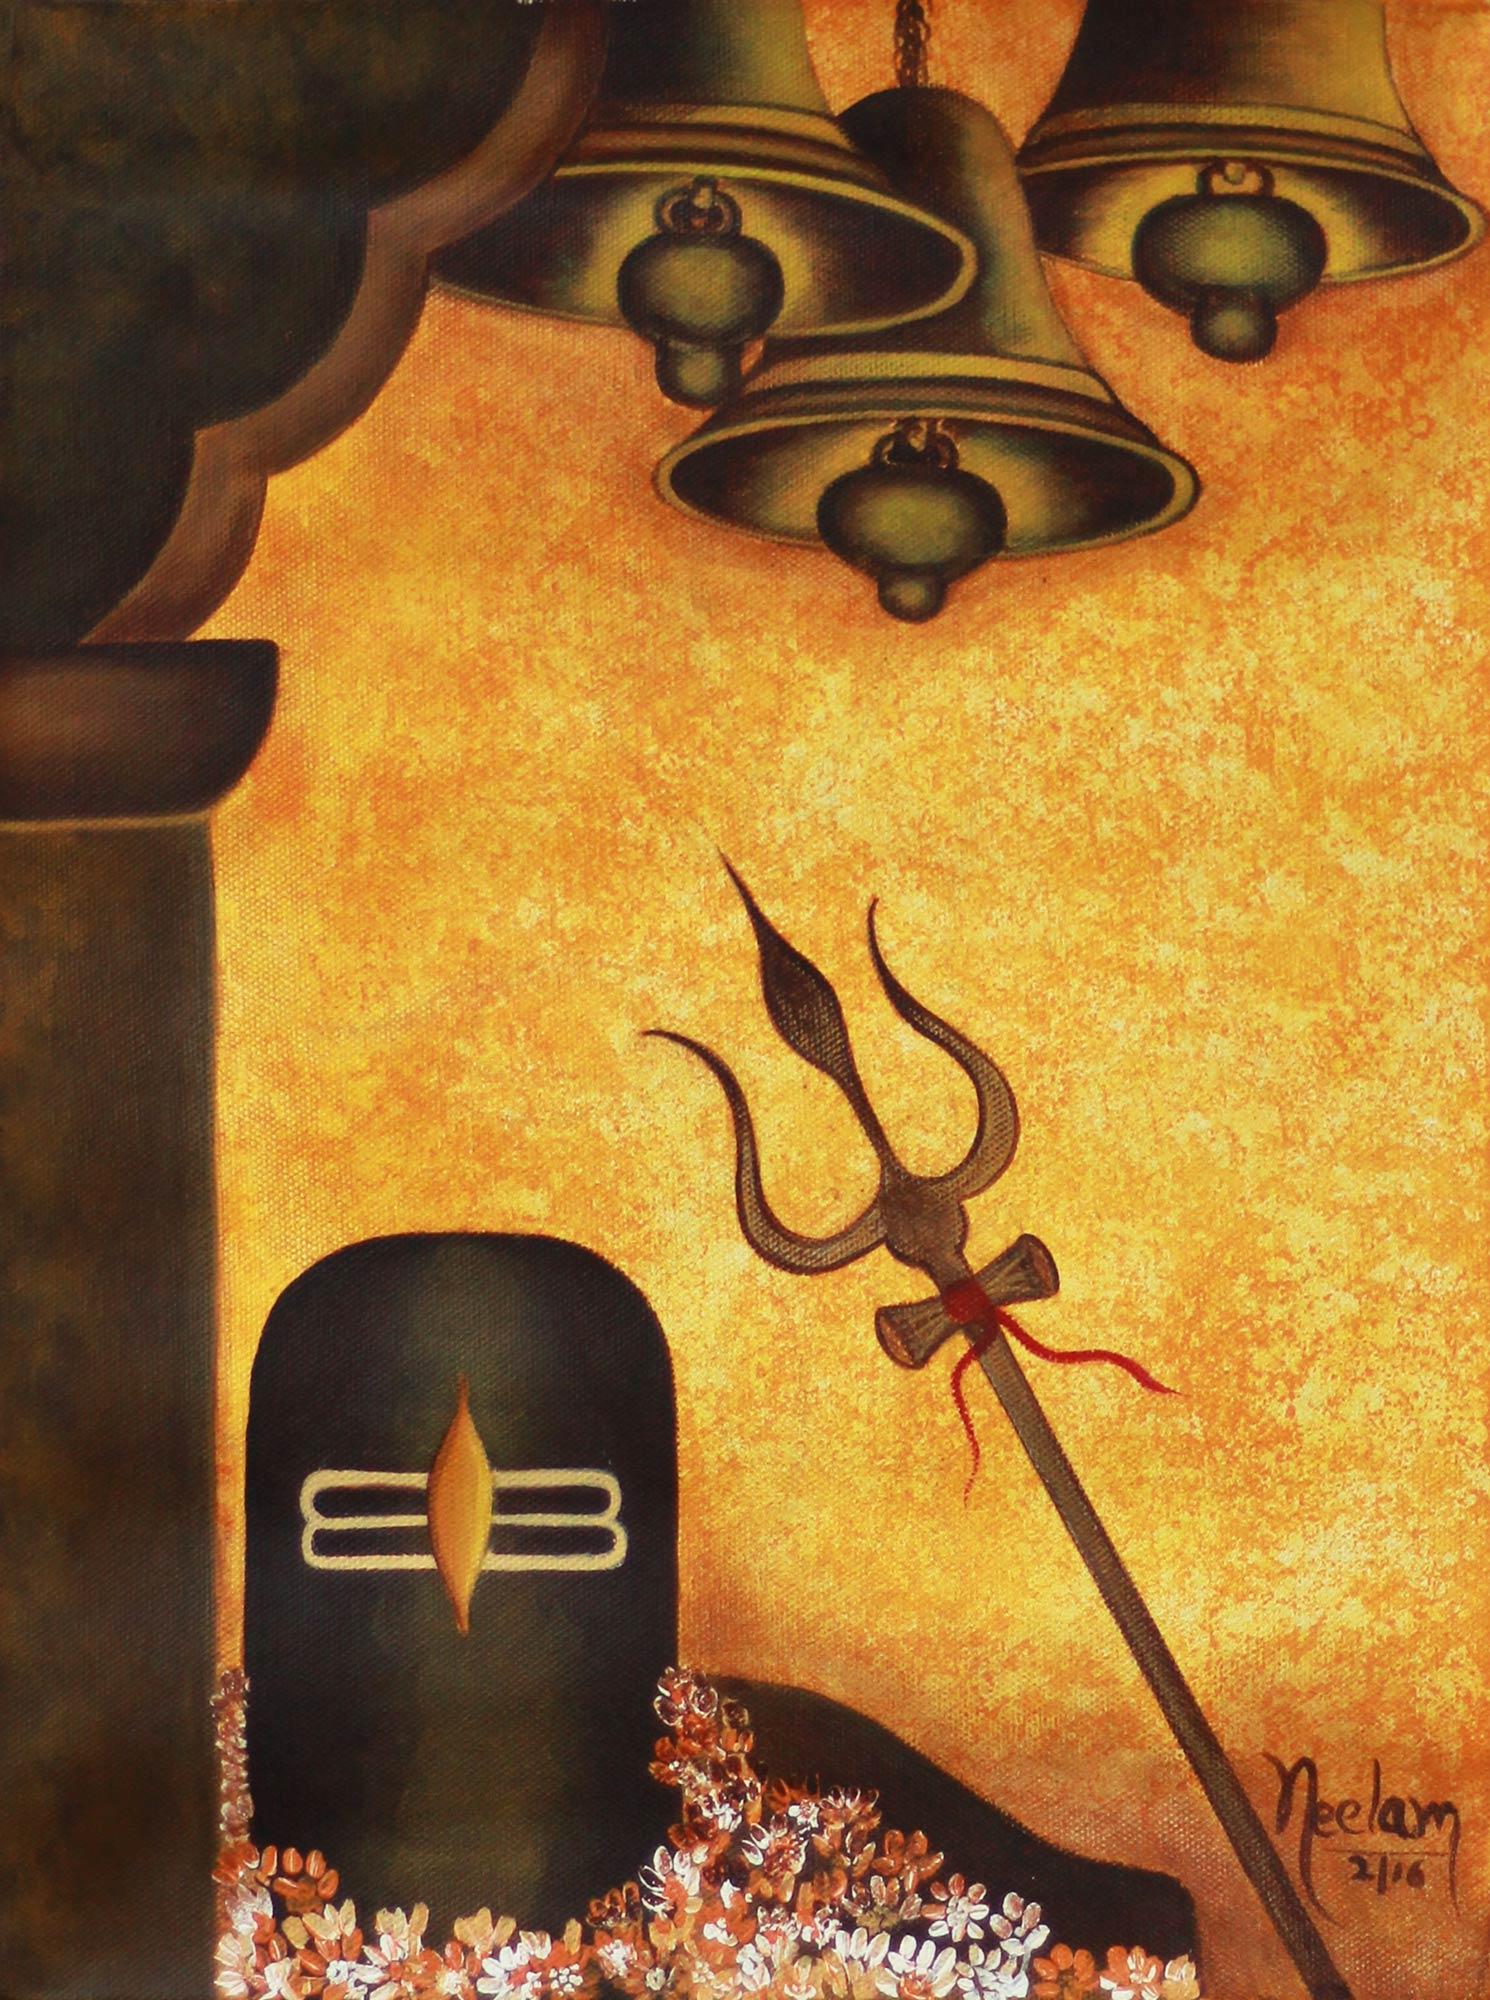 Brown and Orange Hindu Art Painting with Symbols of Shiva - Shiva ...